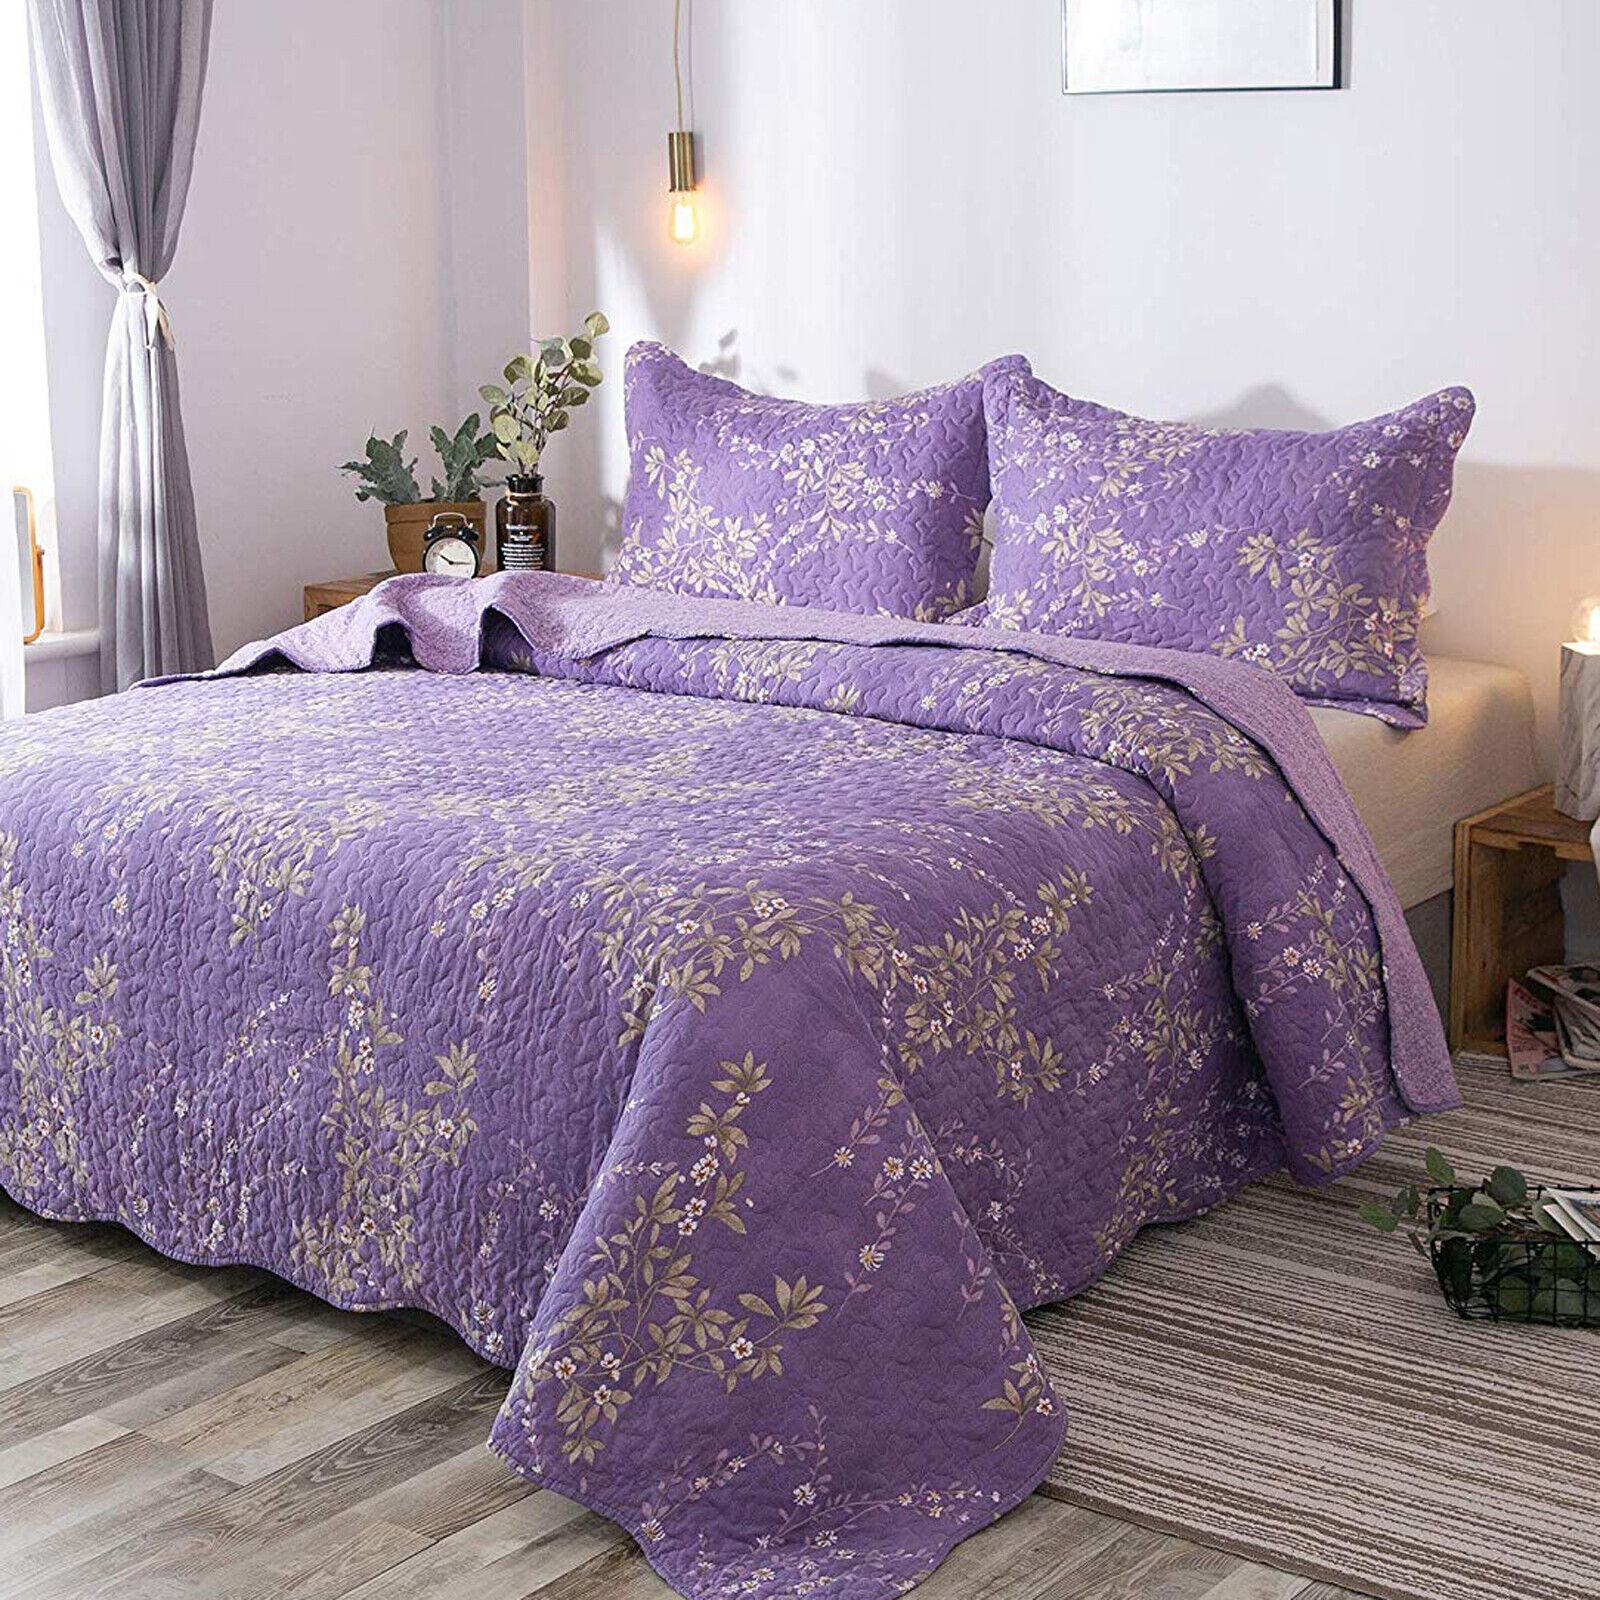 Luxury Floral Pattern Bedspread Printed Quilt Coverlet Blank